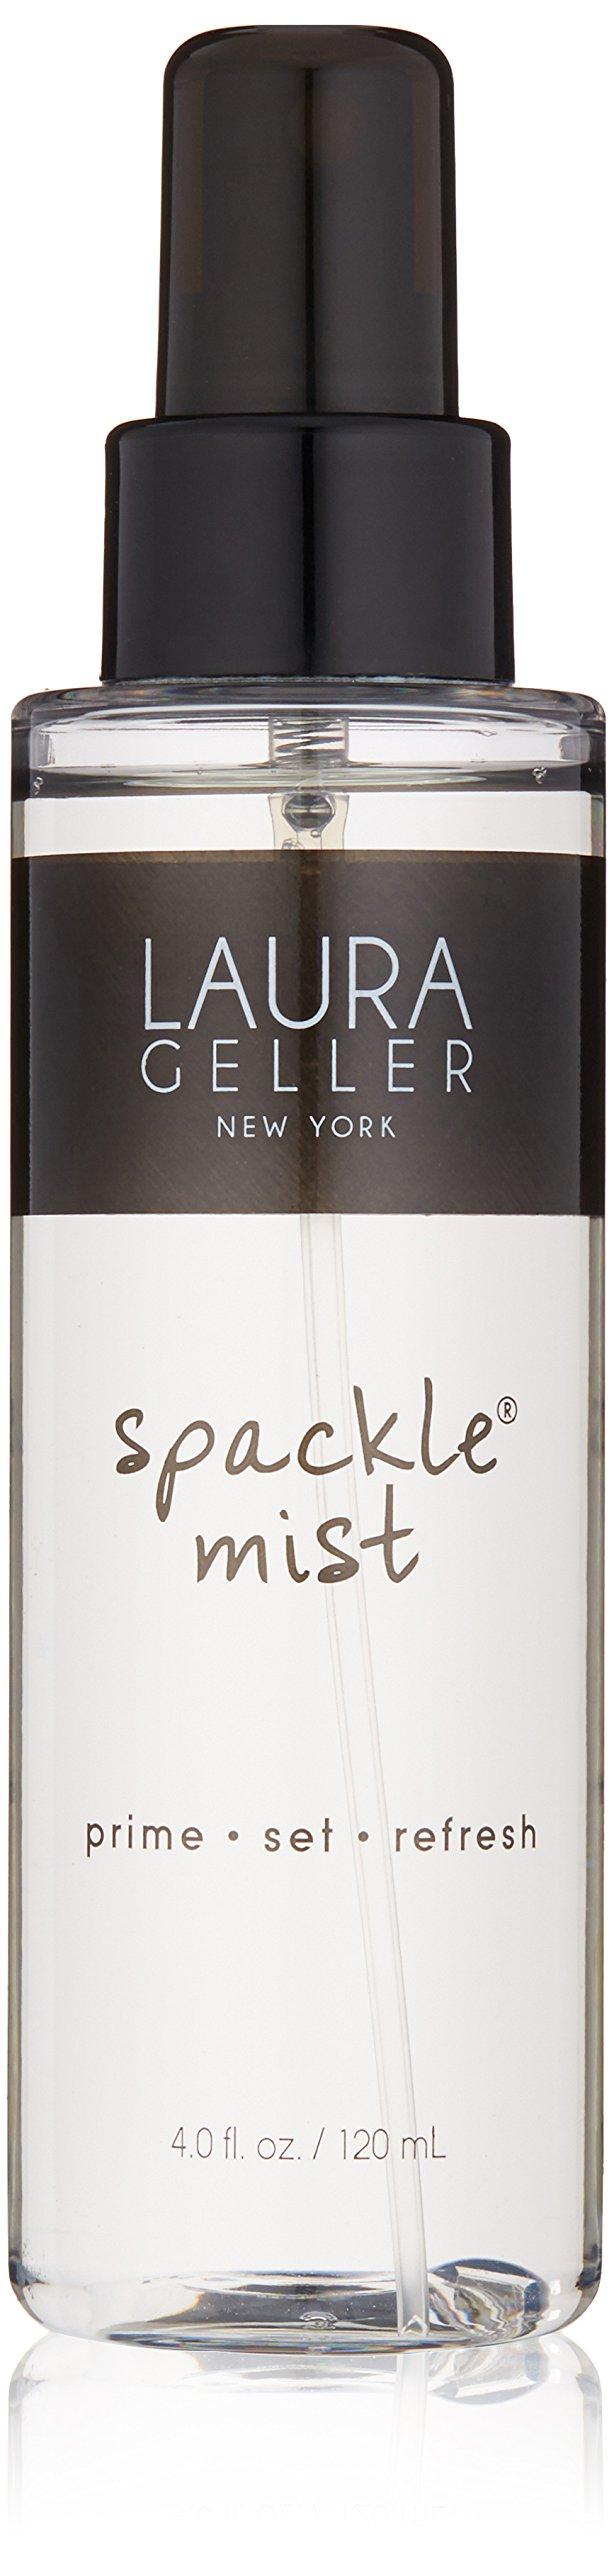 Laura Geller New York Spackle Mist, 4.0 Fl Oz